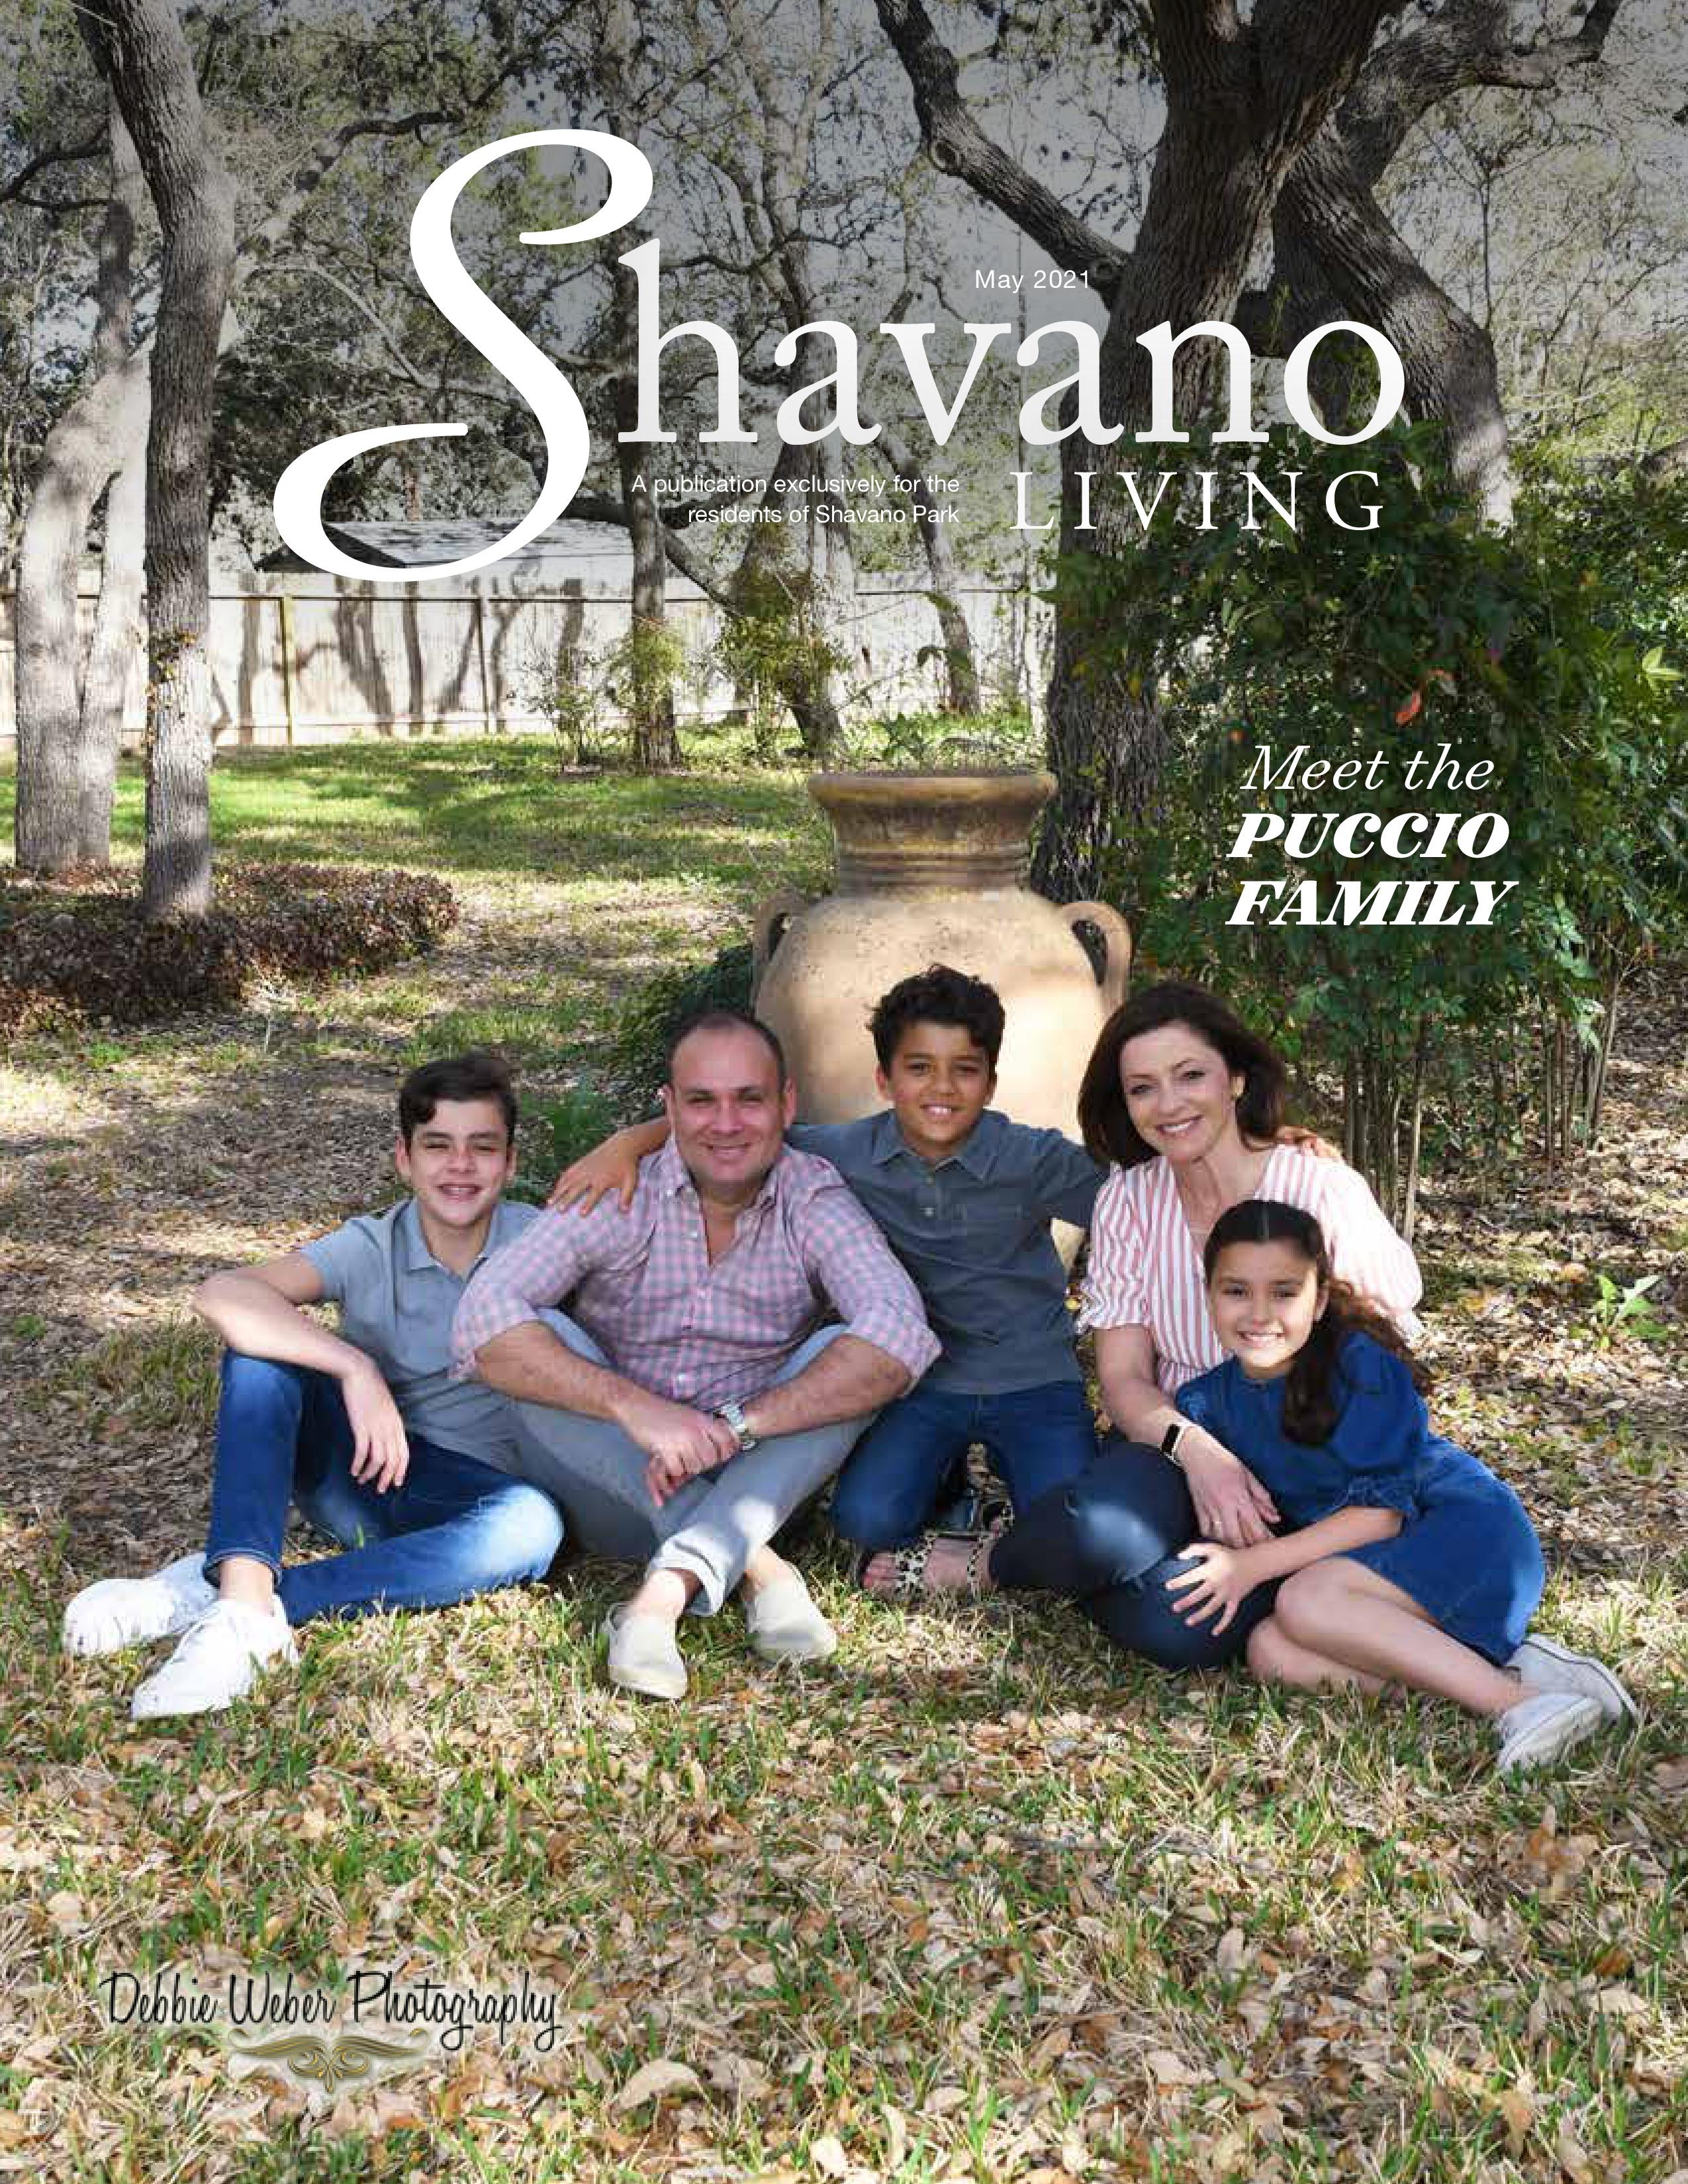 Shavano Living 2021-05-01